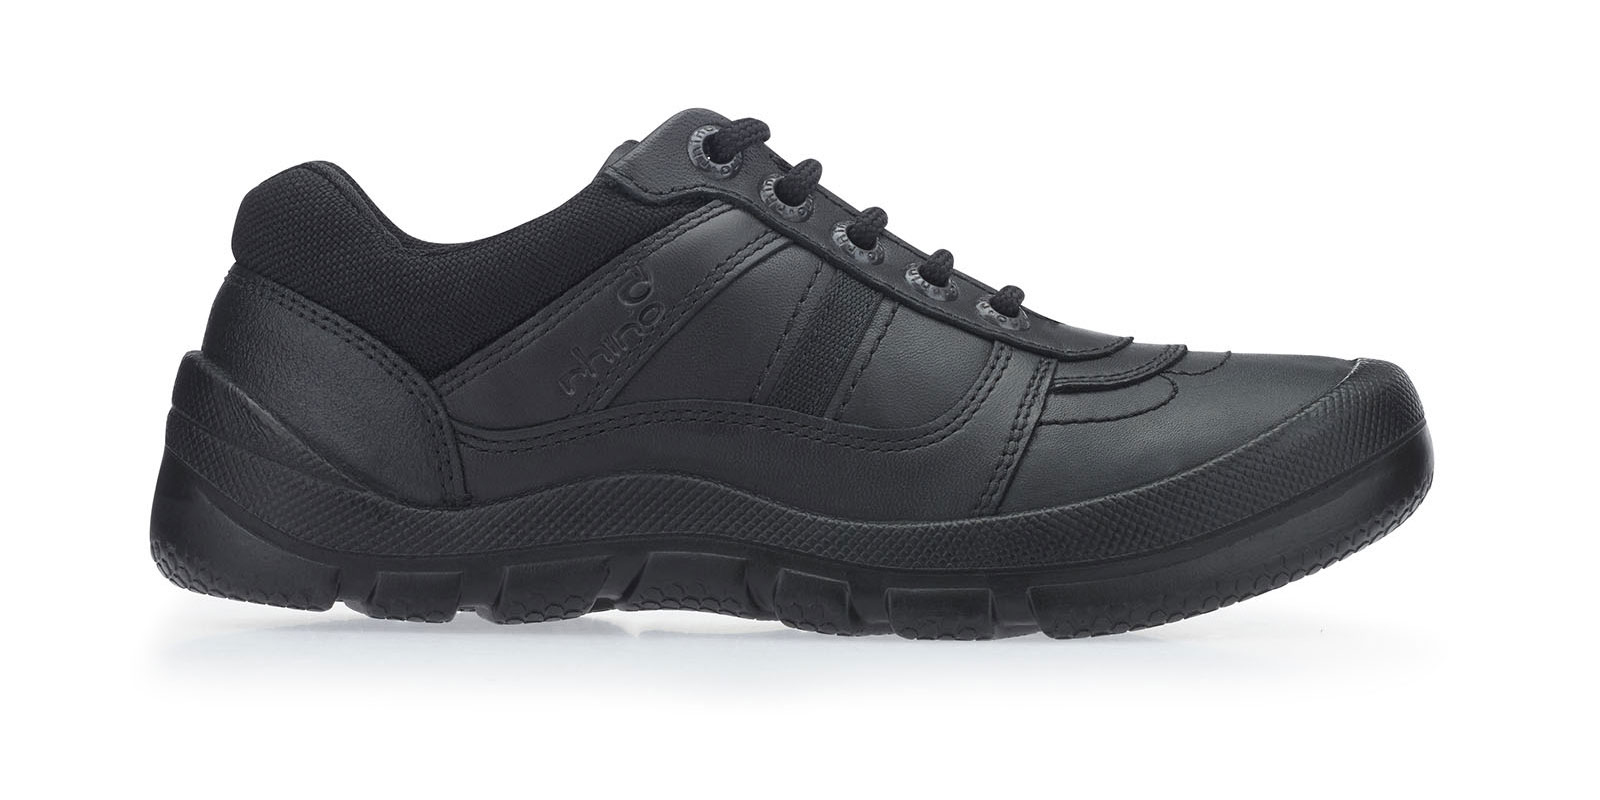 Rhino Sherman black leather